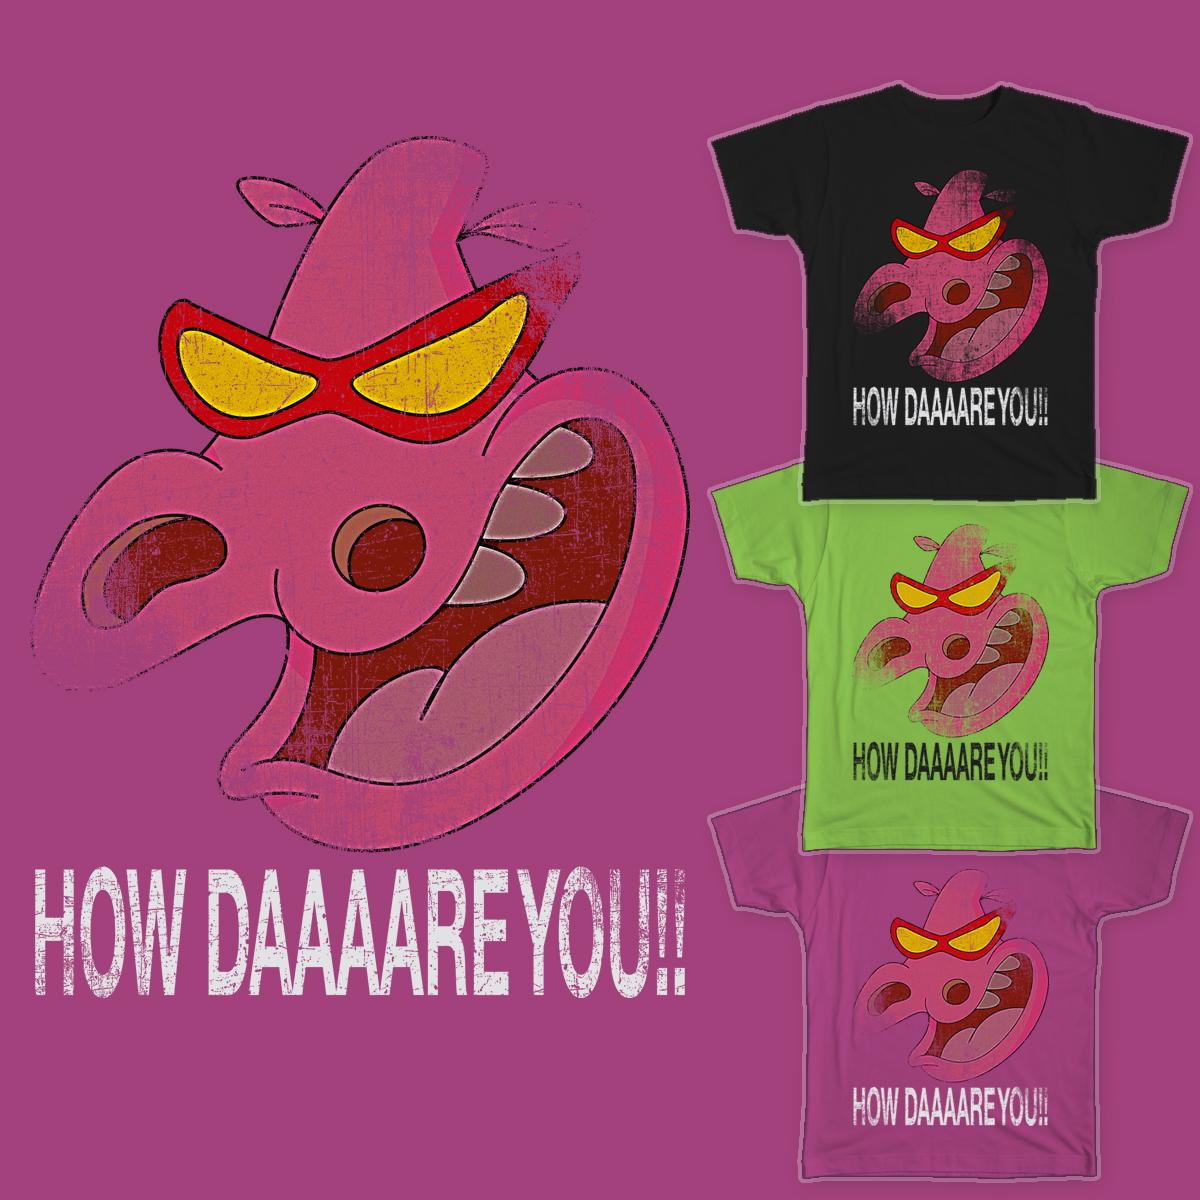 HOW DAAAARE YOU!!!! by Flower Bean on Threadless